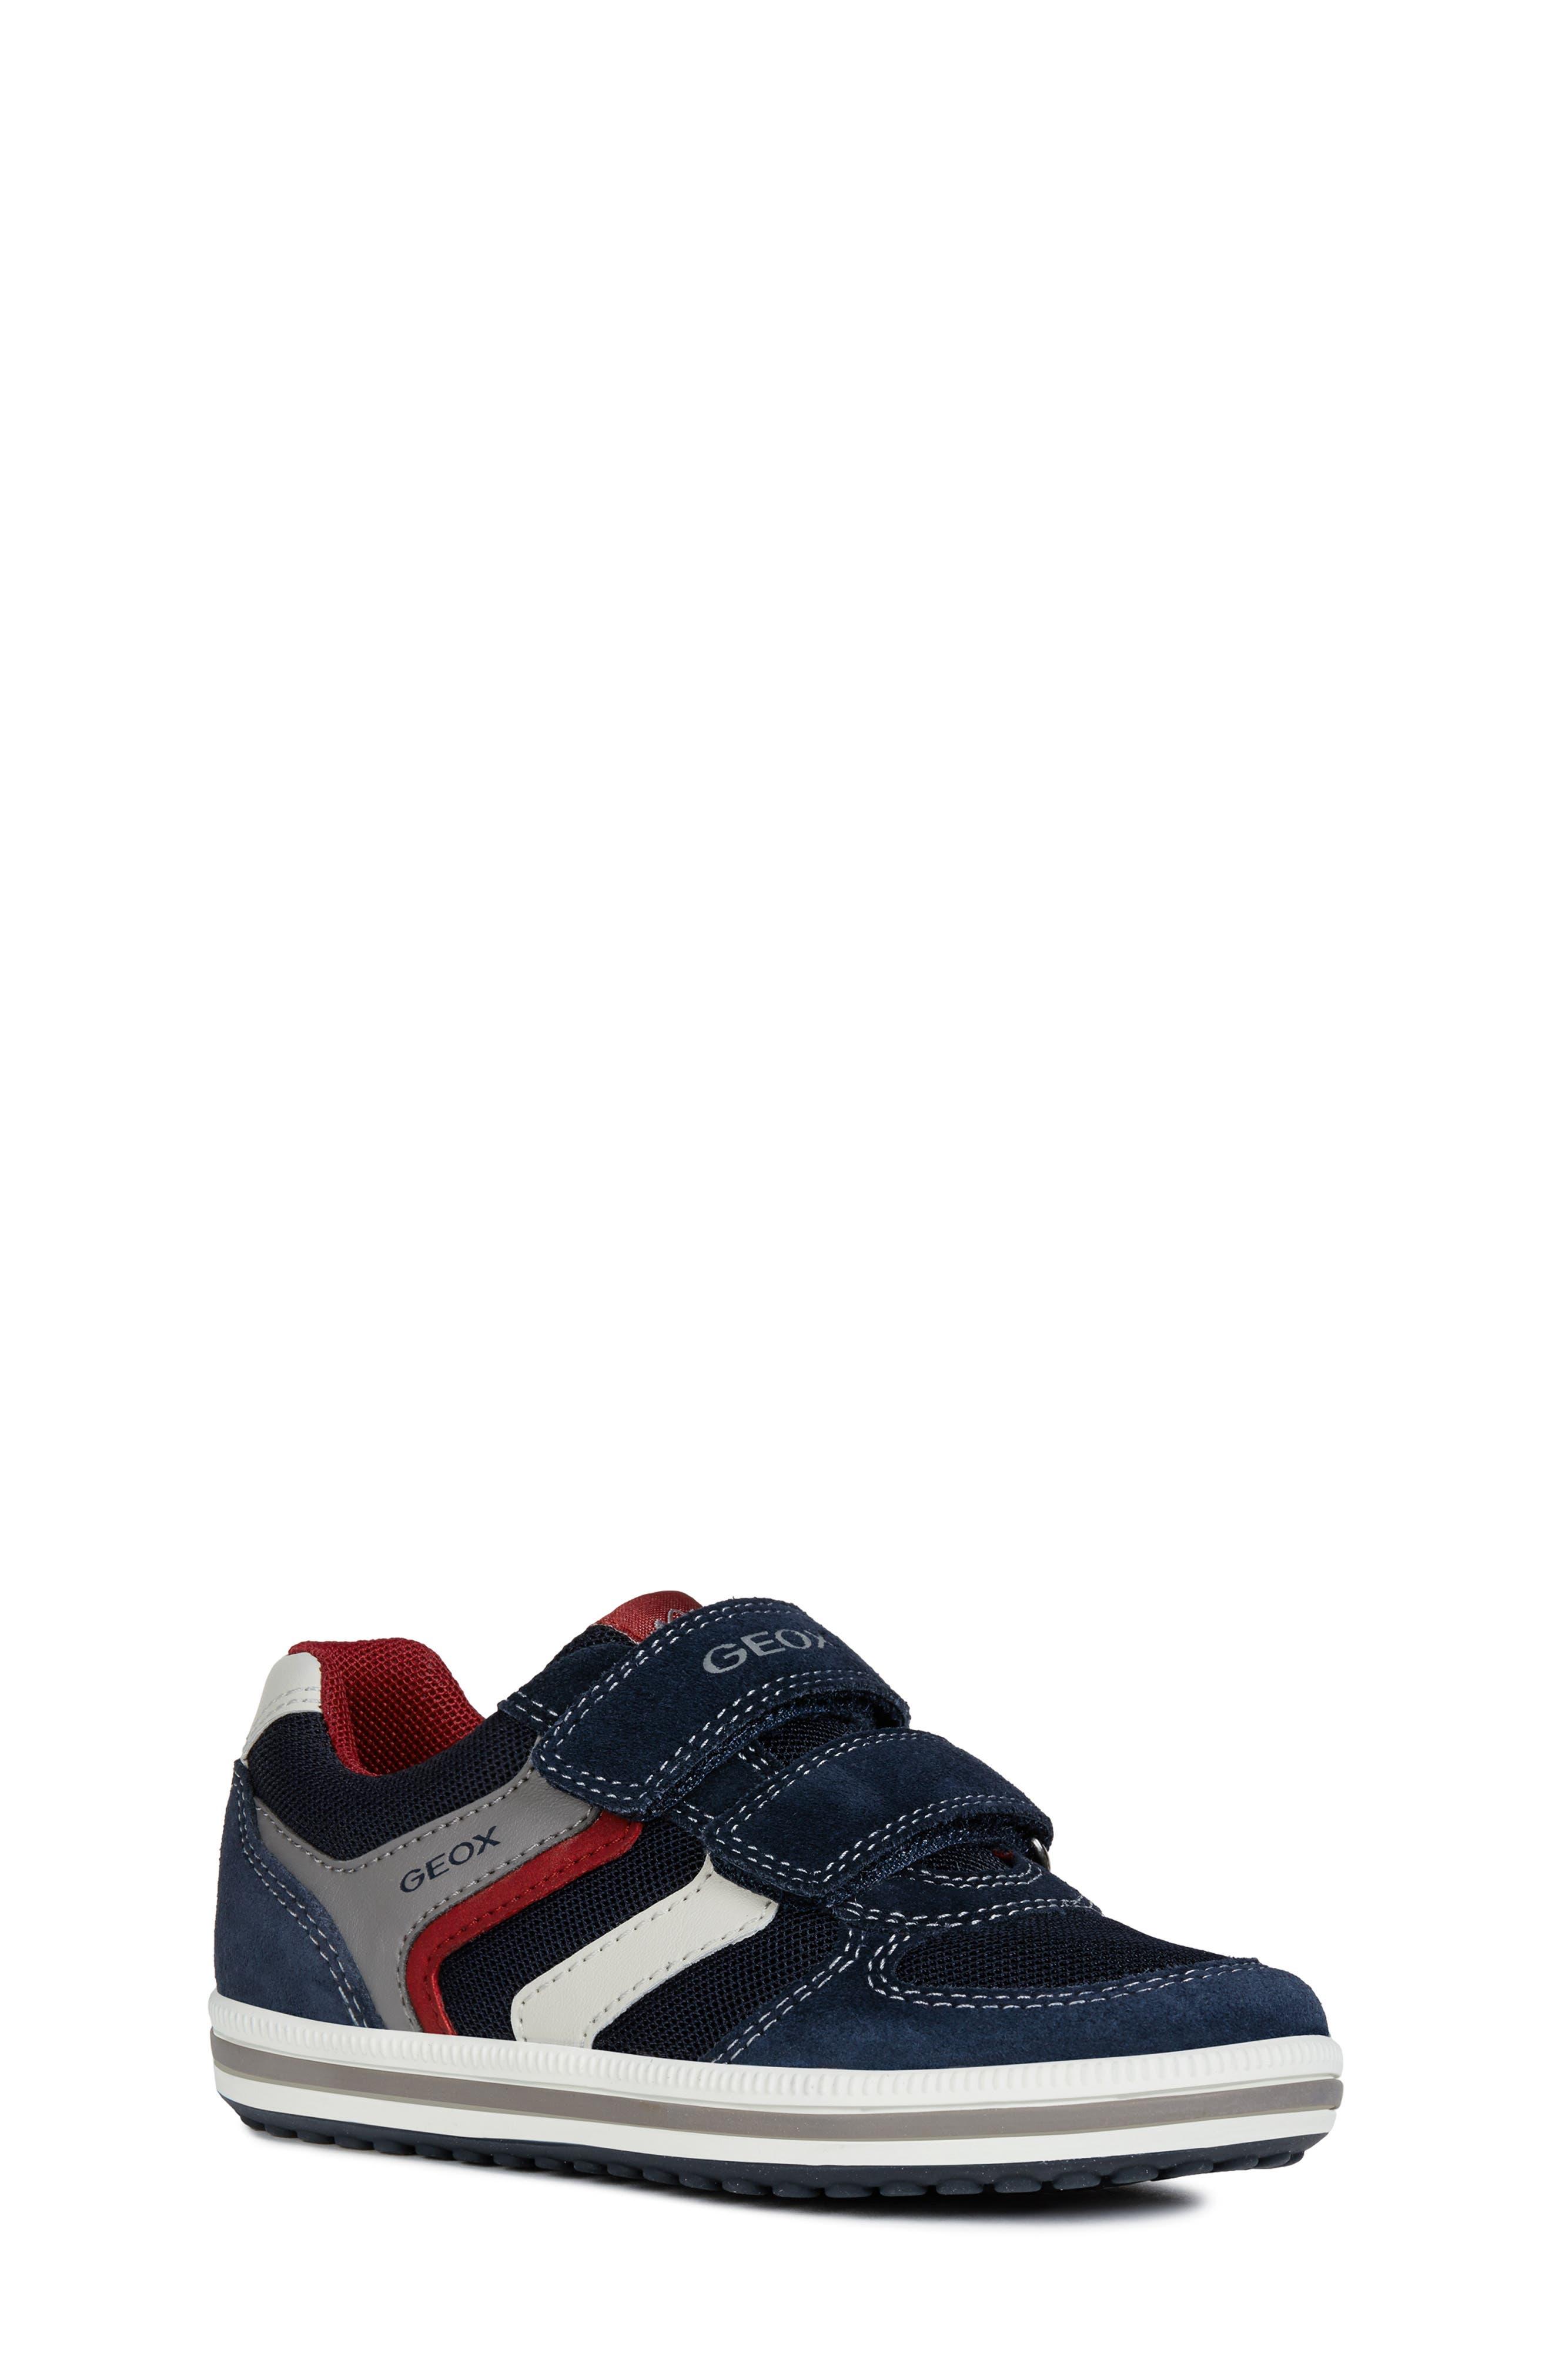 GEOX 'Vita' Sneaker, Main, color, NAVY/ RED